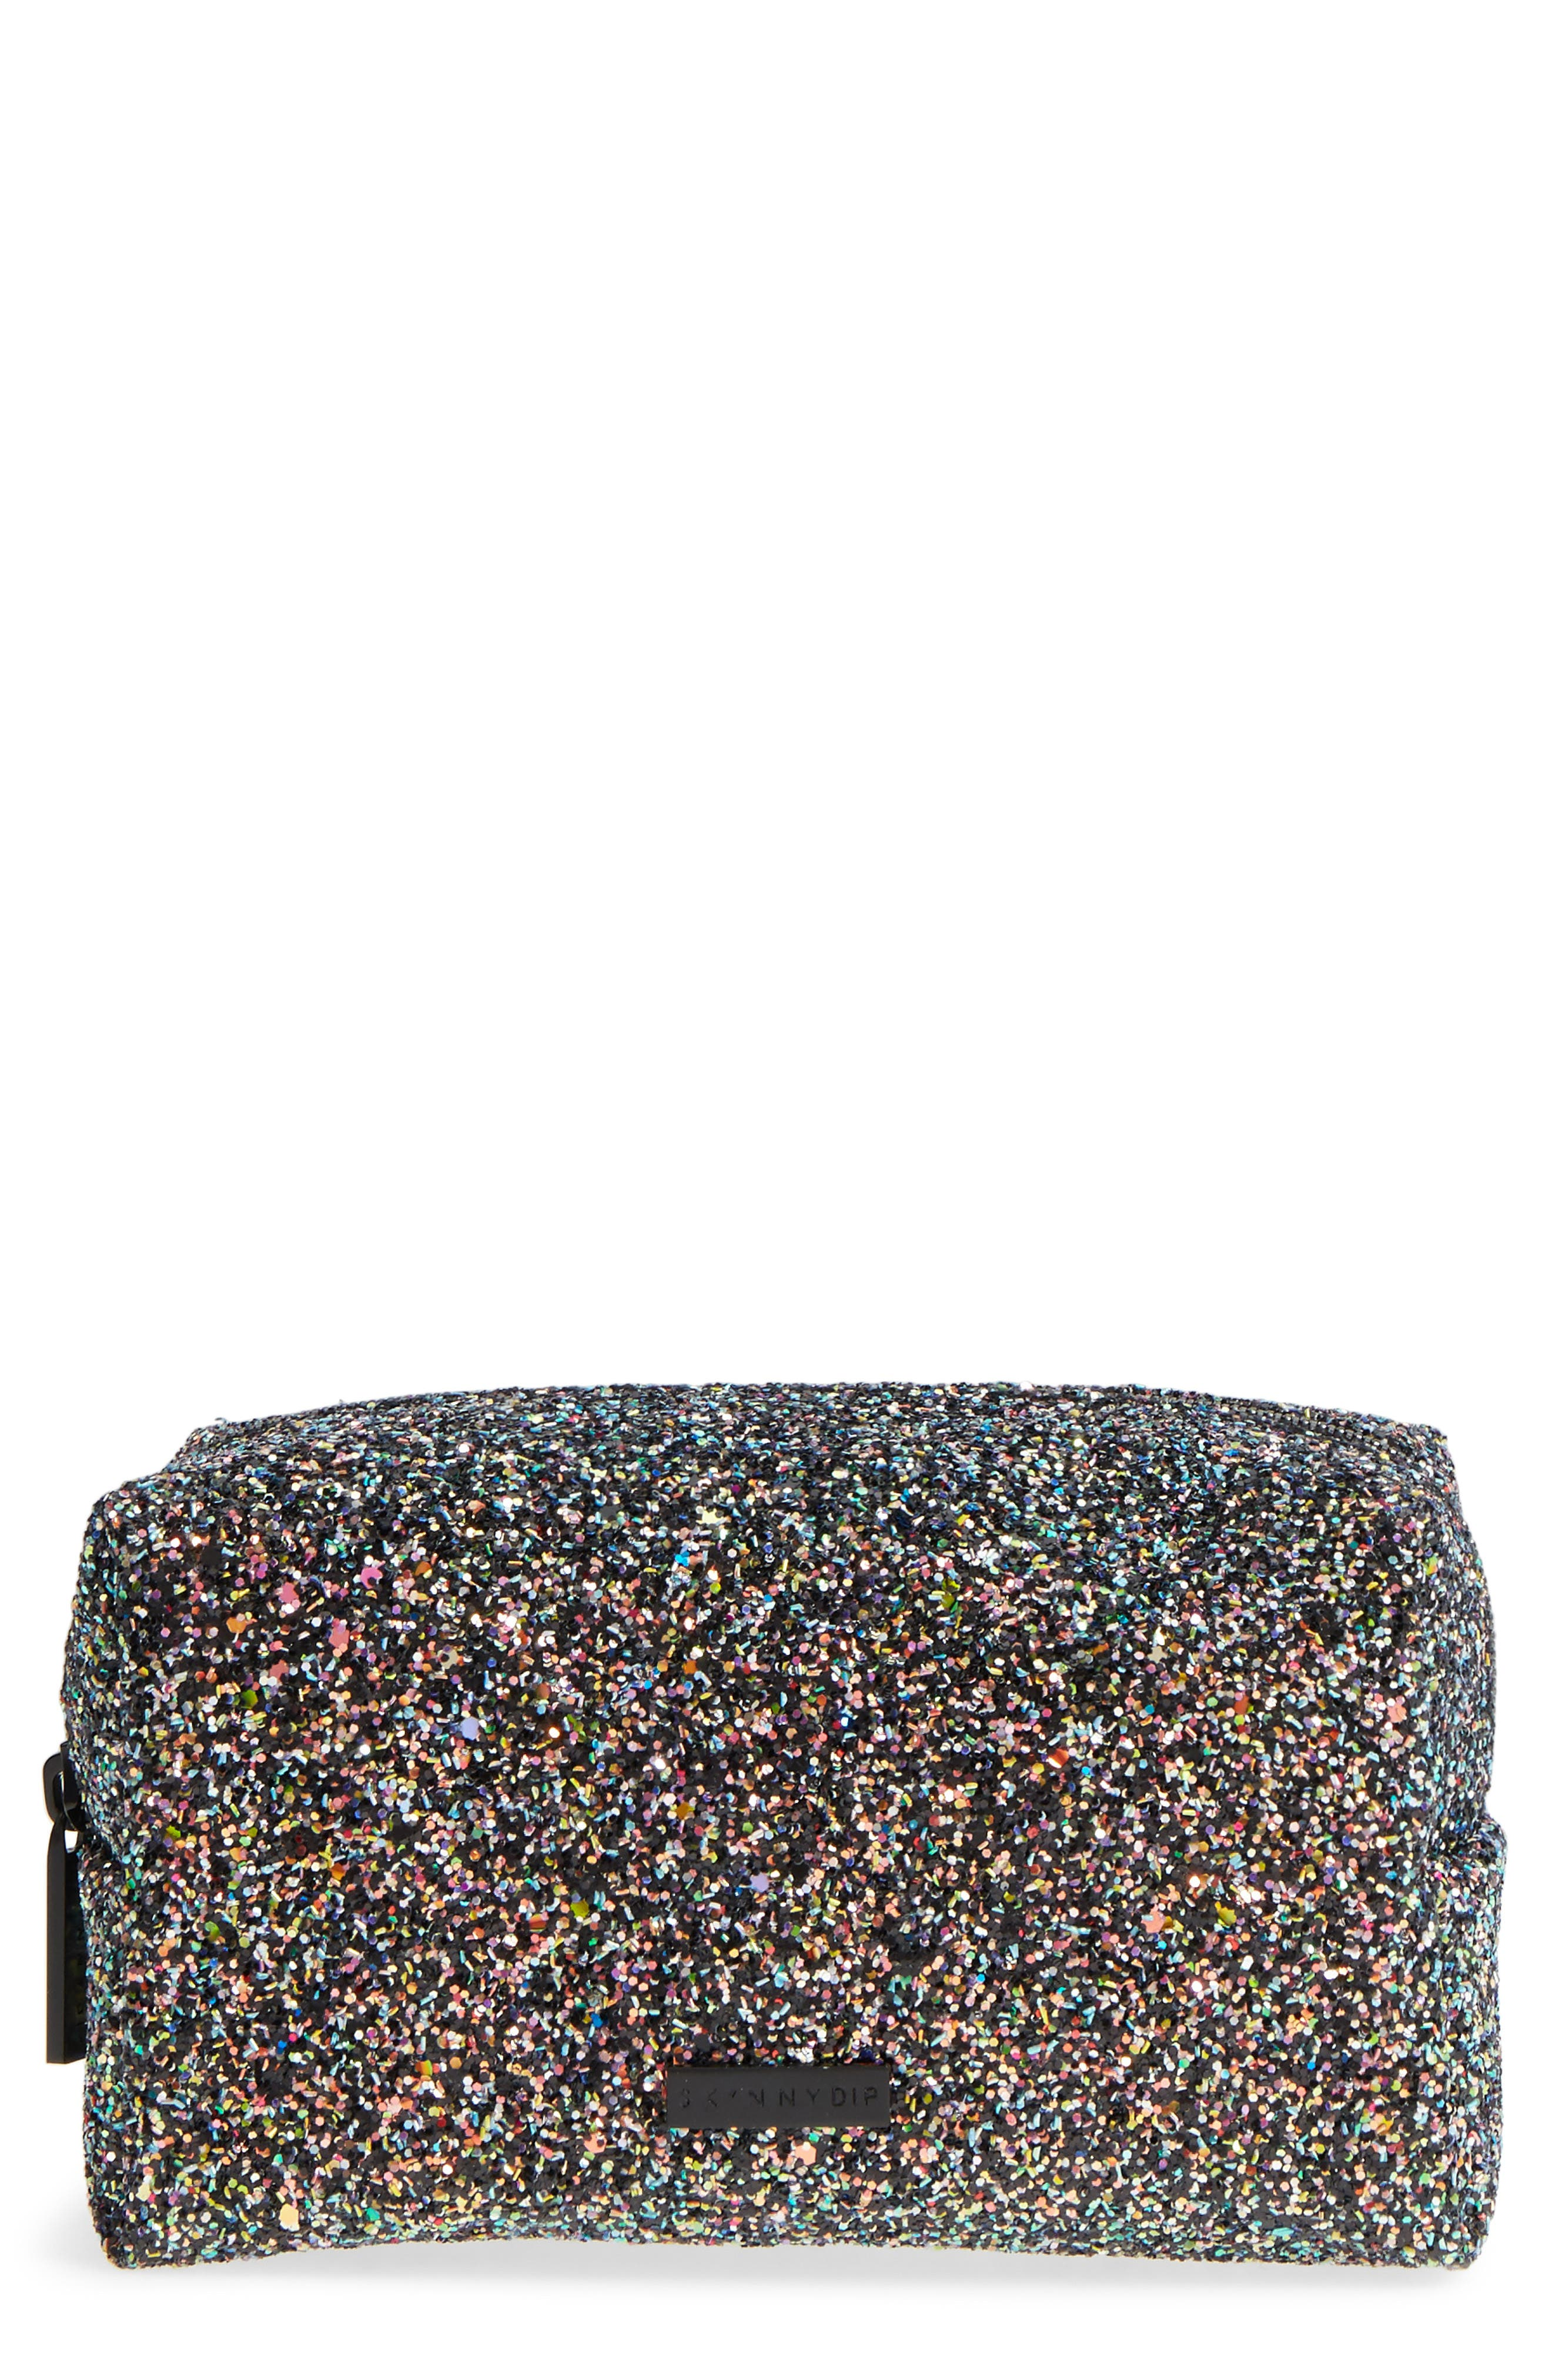 Skinny Dip Liquorice Glitter Cosmetics Bag,                         Main,                         color, No Color